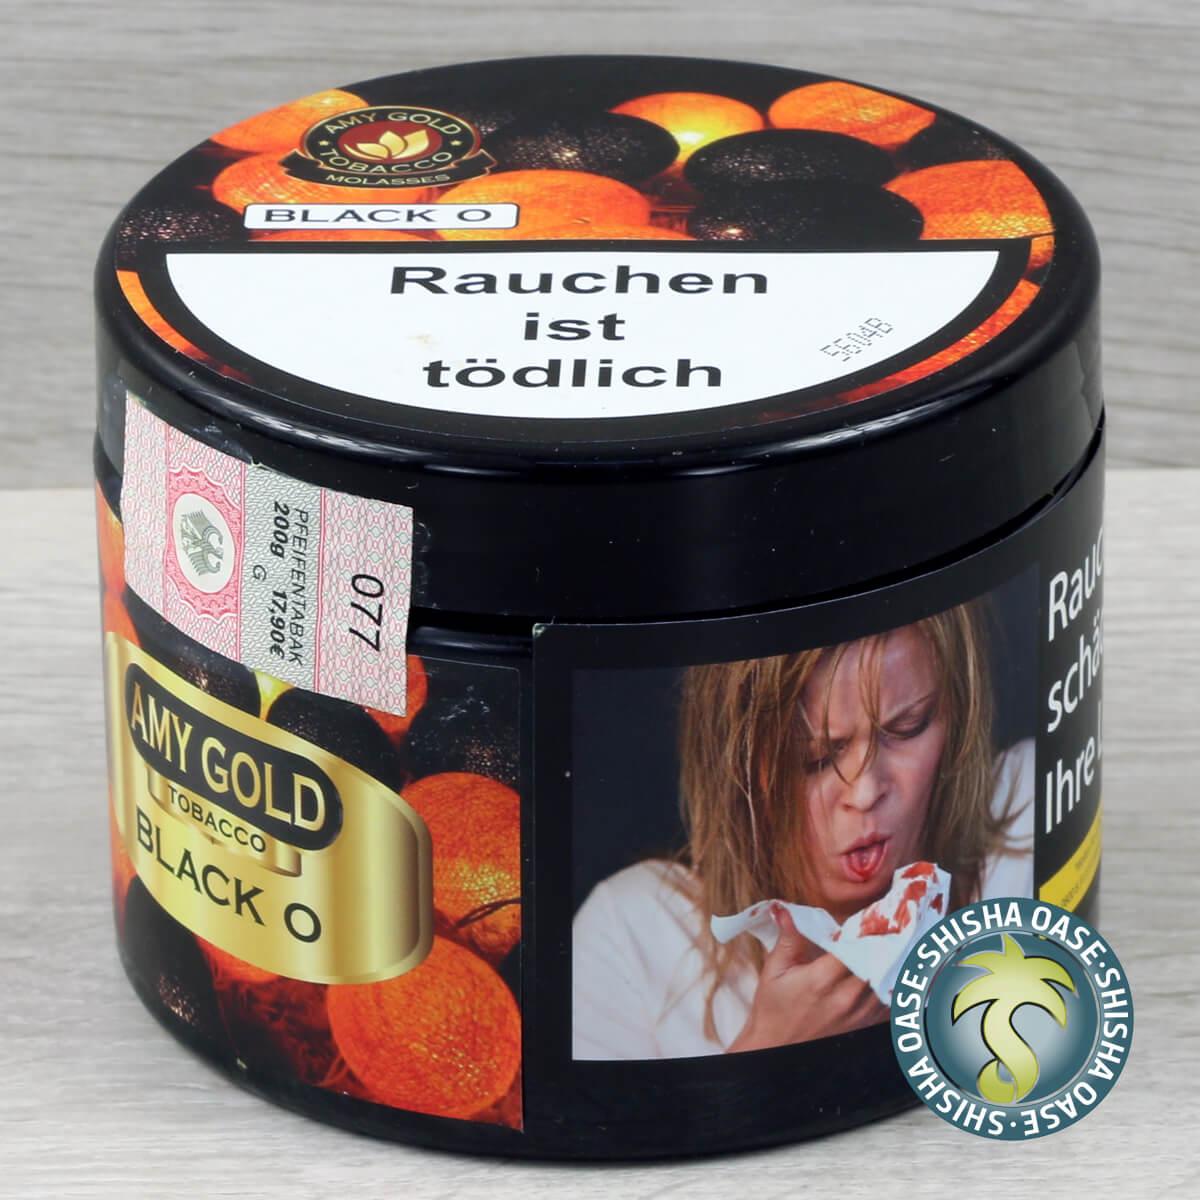 Amy Gold Tobacco Black O 200g Dose